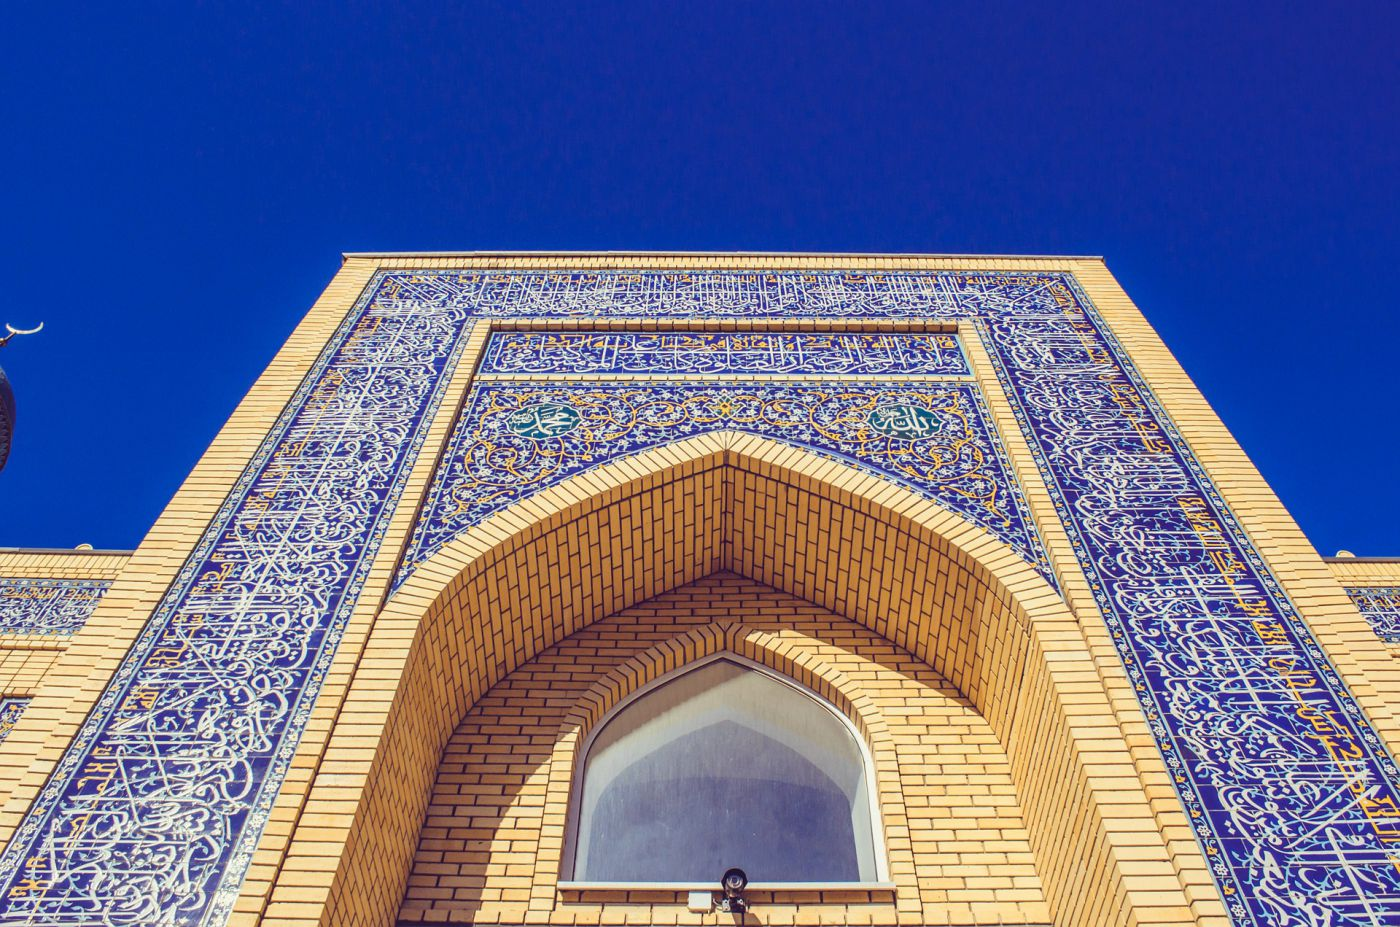 mosque-331116_1920